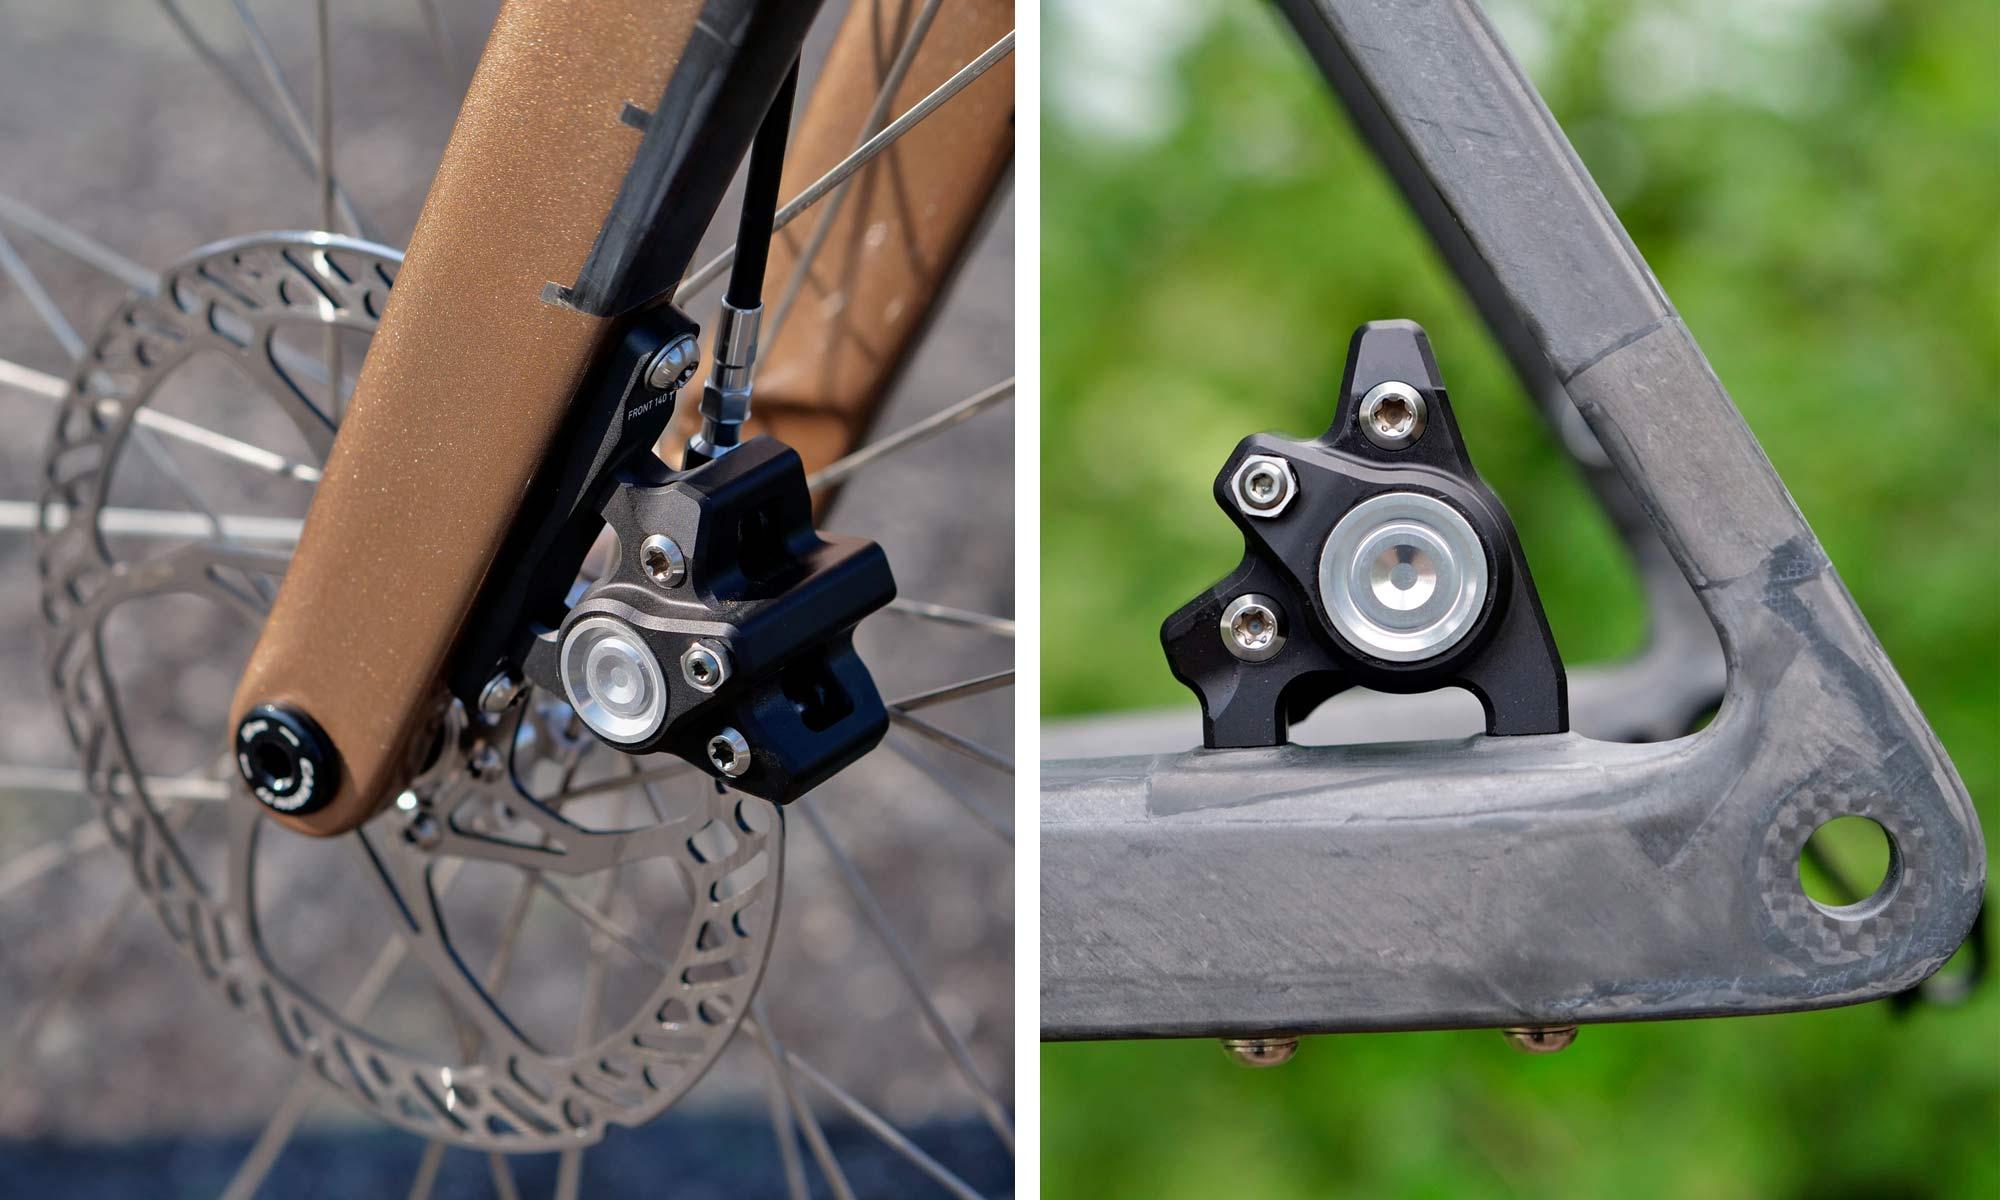 custom Scott Addict Gravel Tuned Dangerholm edition lightweight carbon prototype gravel bike project,Trickstuff brakes